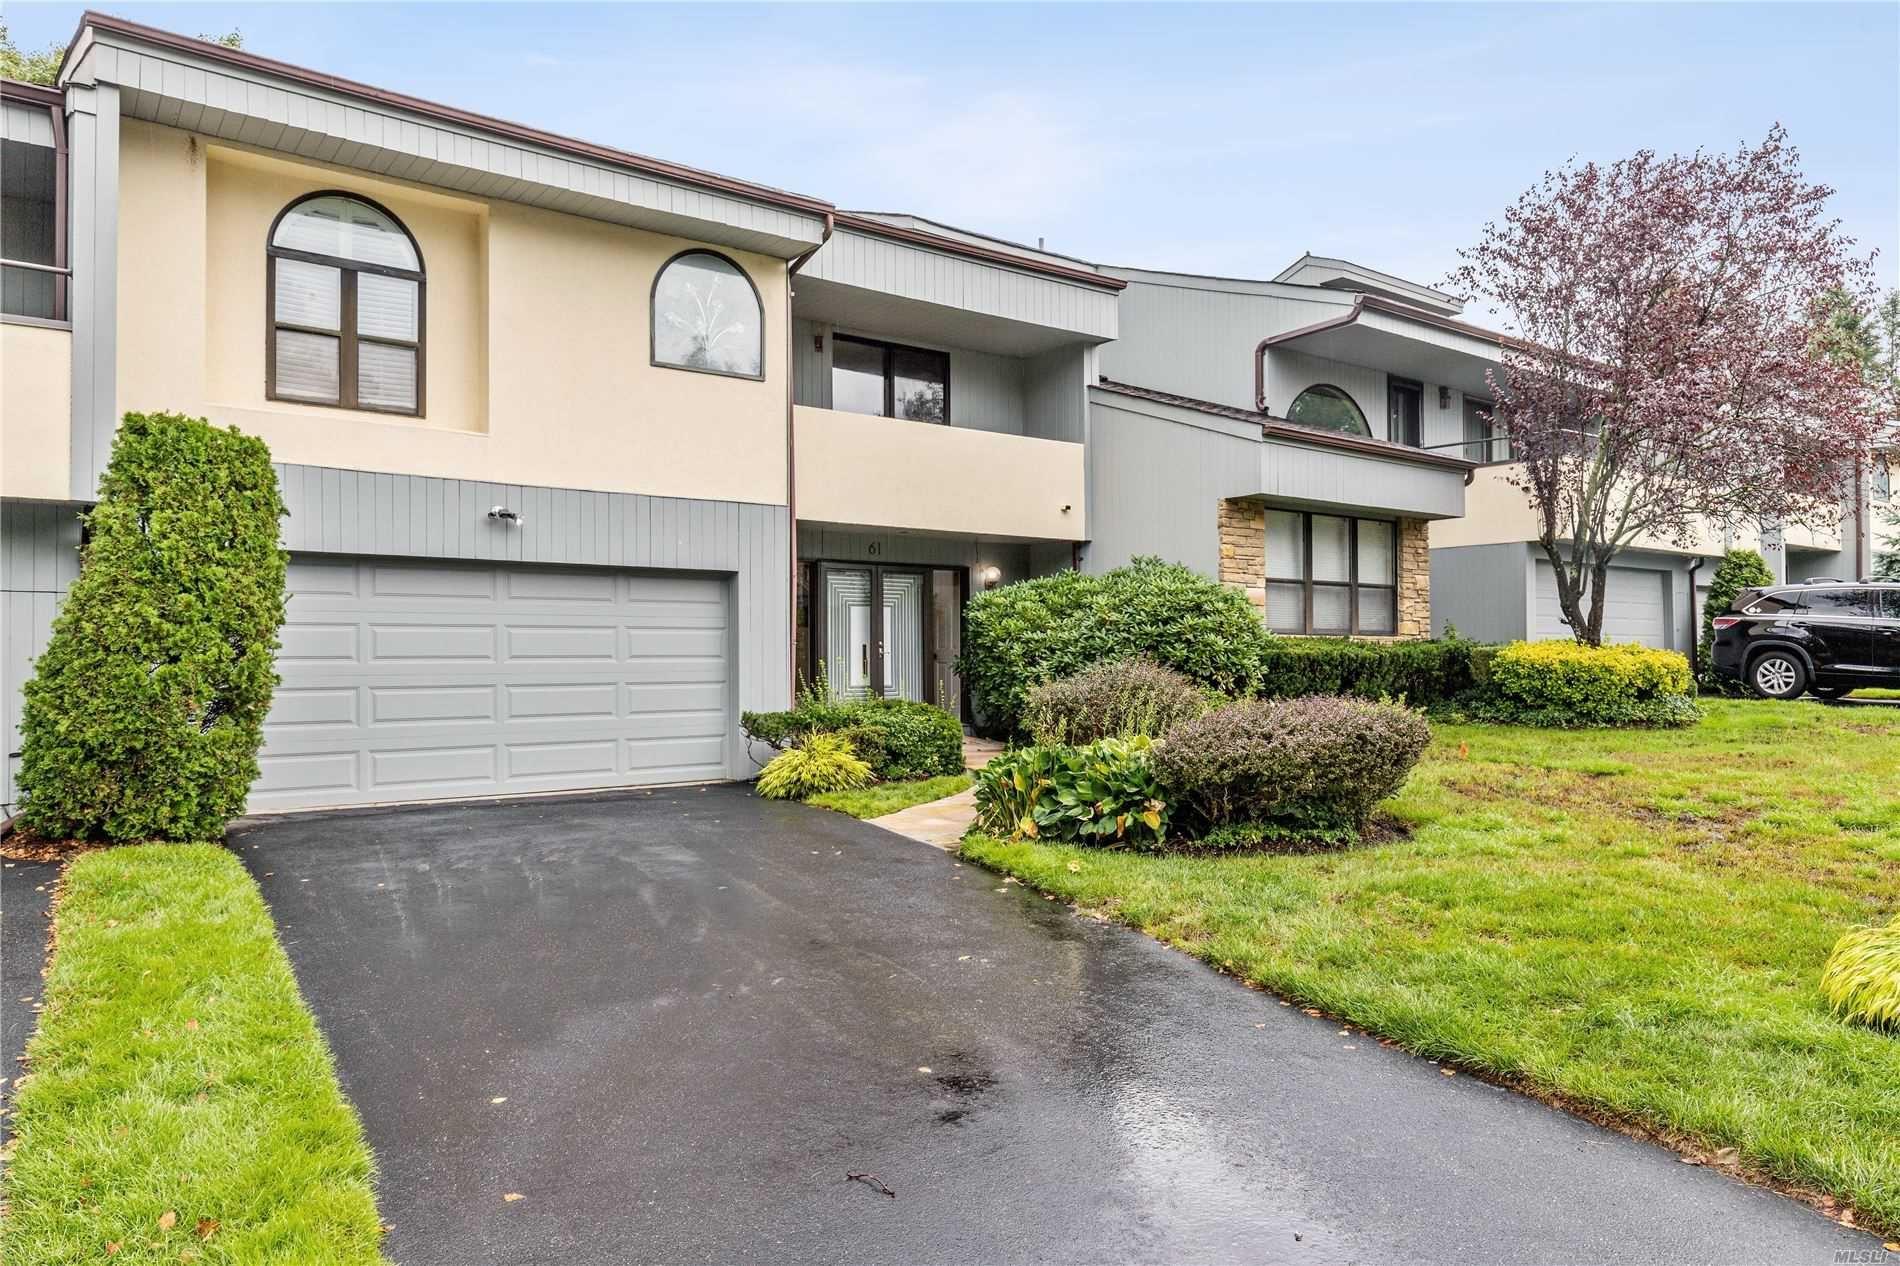 61 Eagle Chase, Woodbury, NY 11797 - MLS#: 3244665